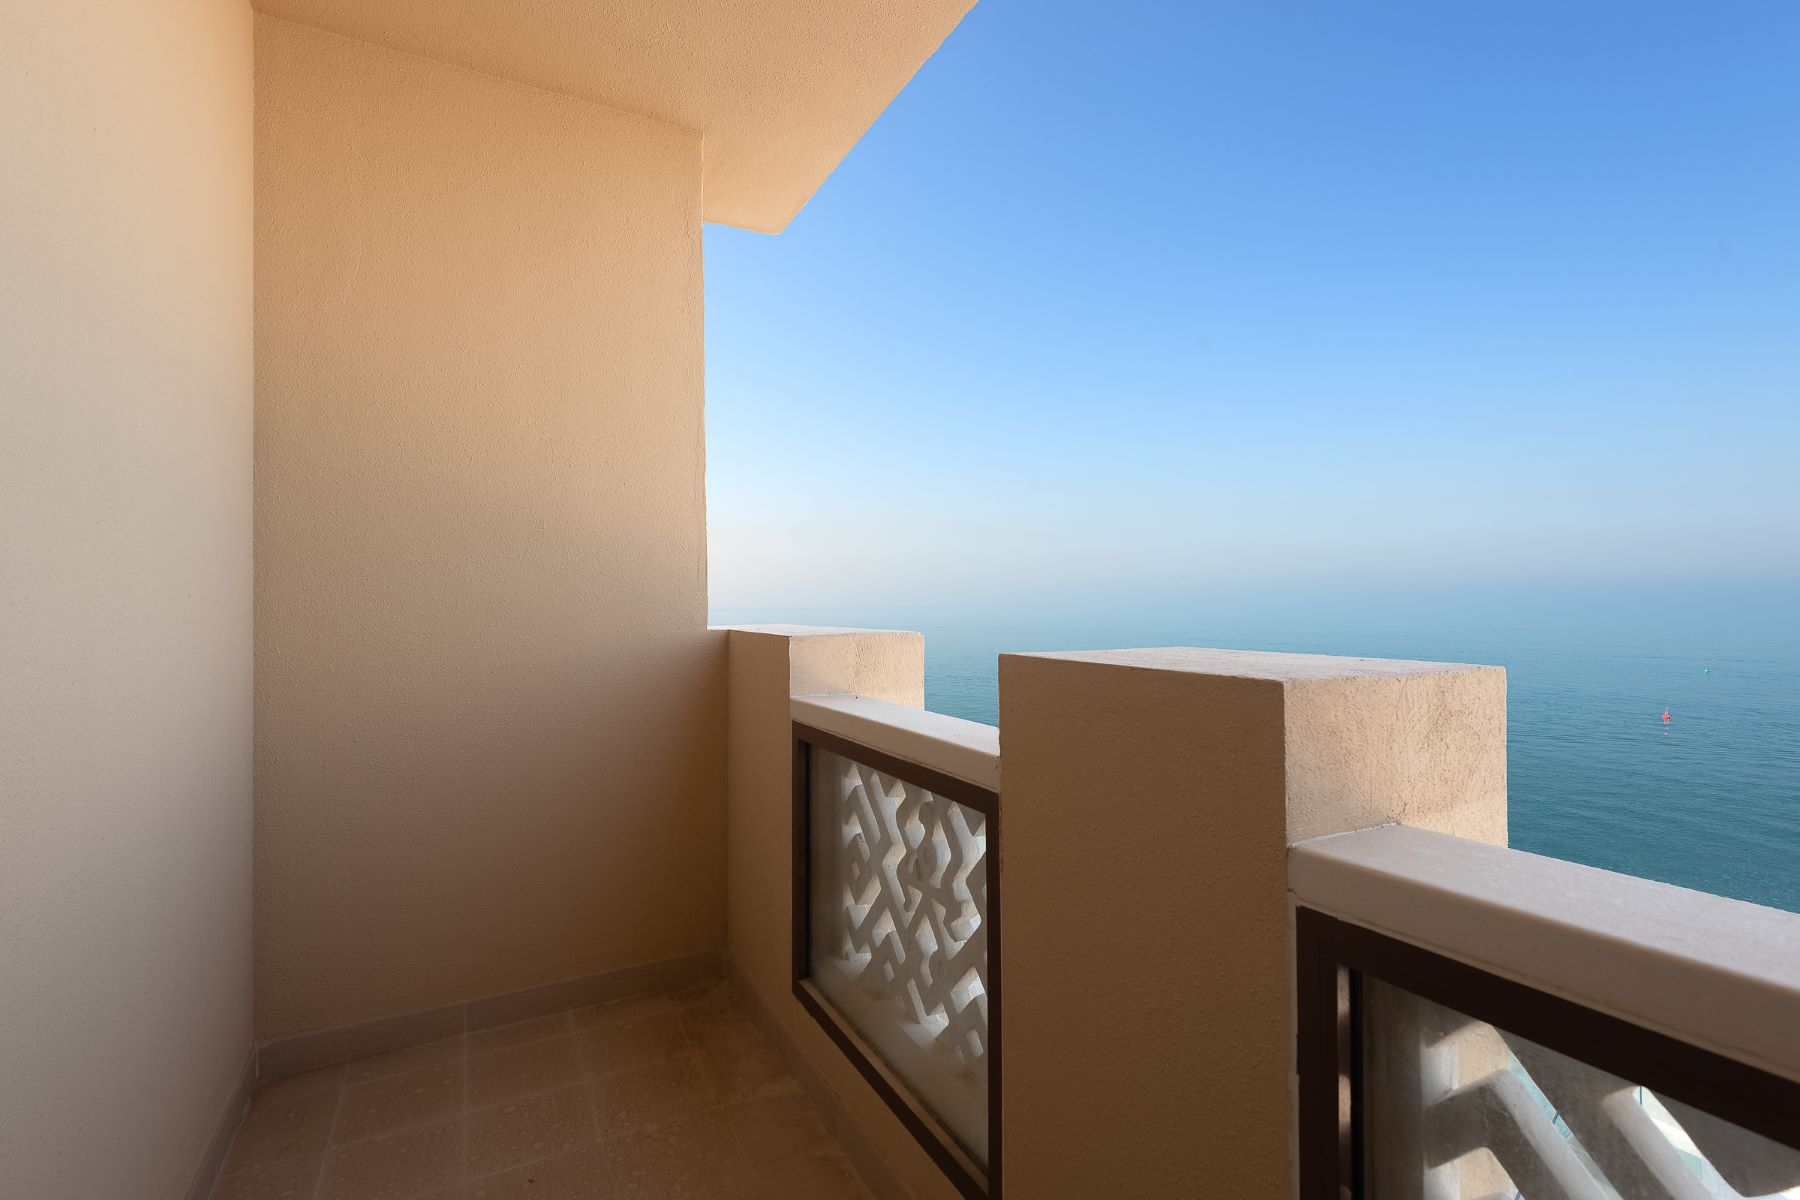 Apartments 为 出租 在 3 Bedroom Duplex with Sea View 迪拜, 杜拜 阿联酋